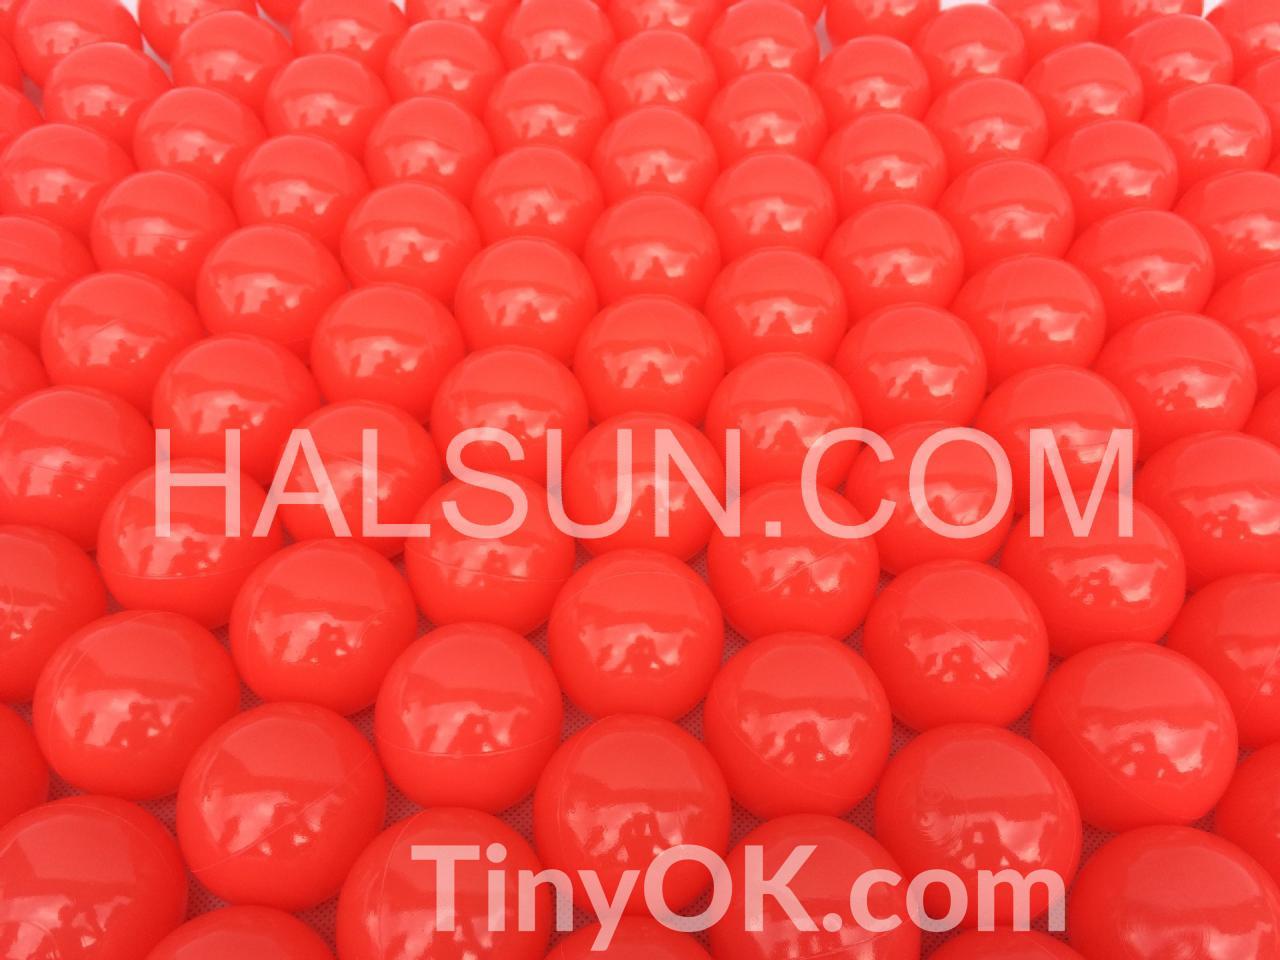 plastic-ocean-balls-10.jpg